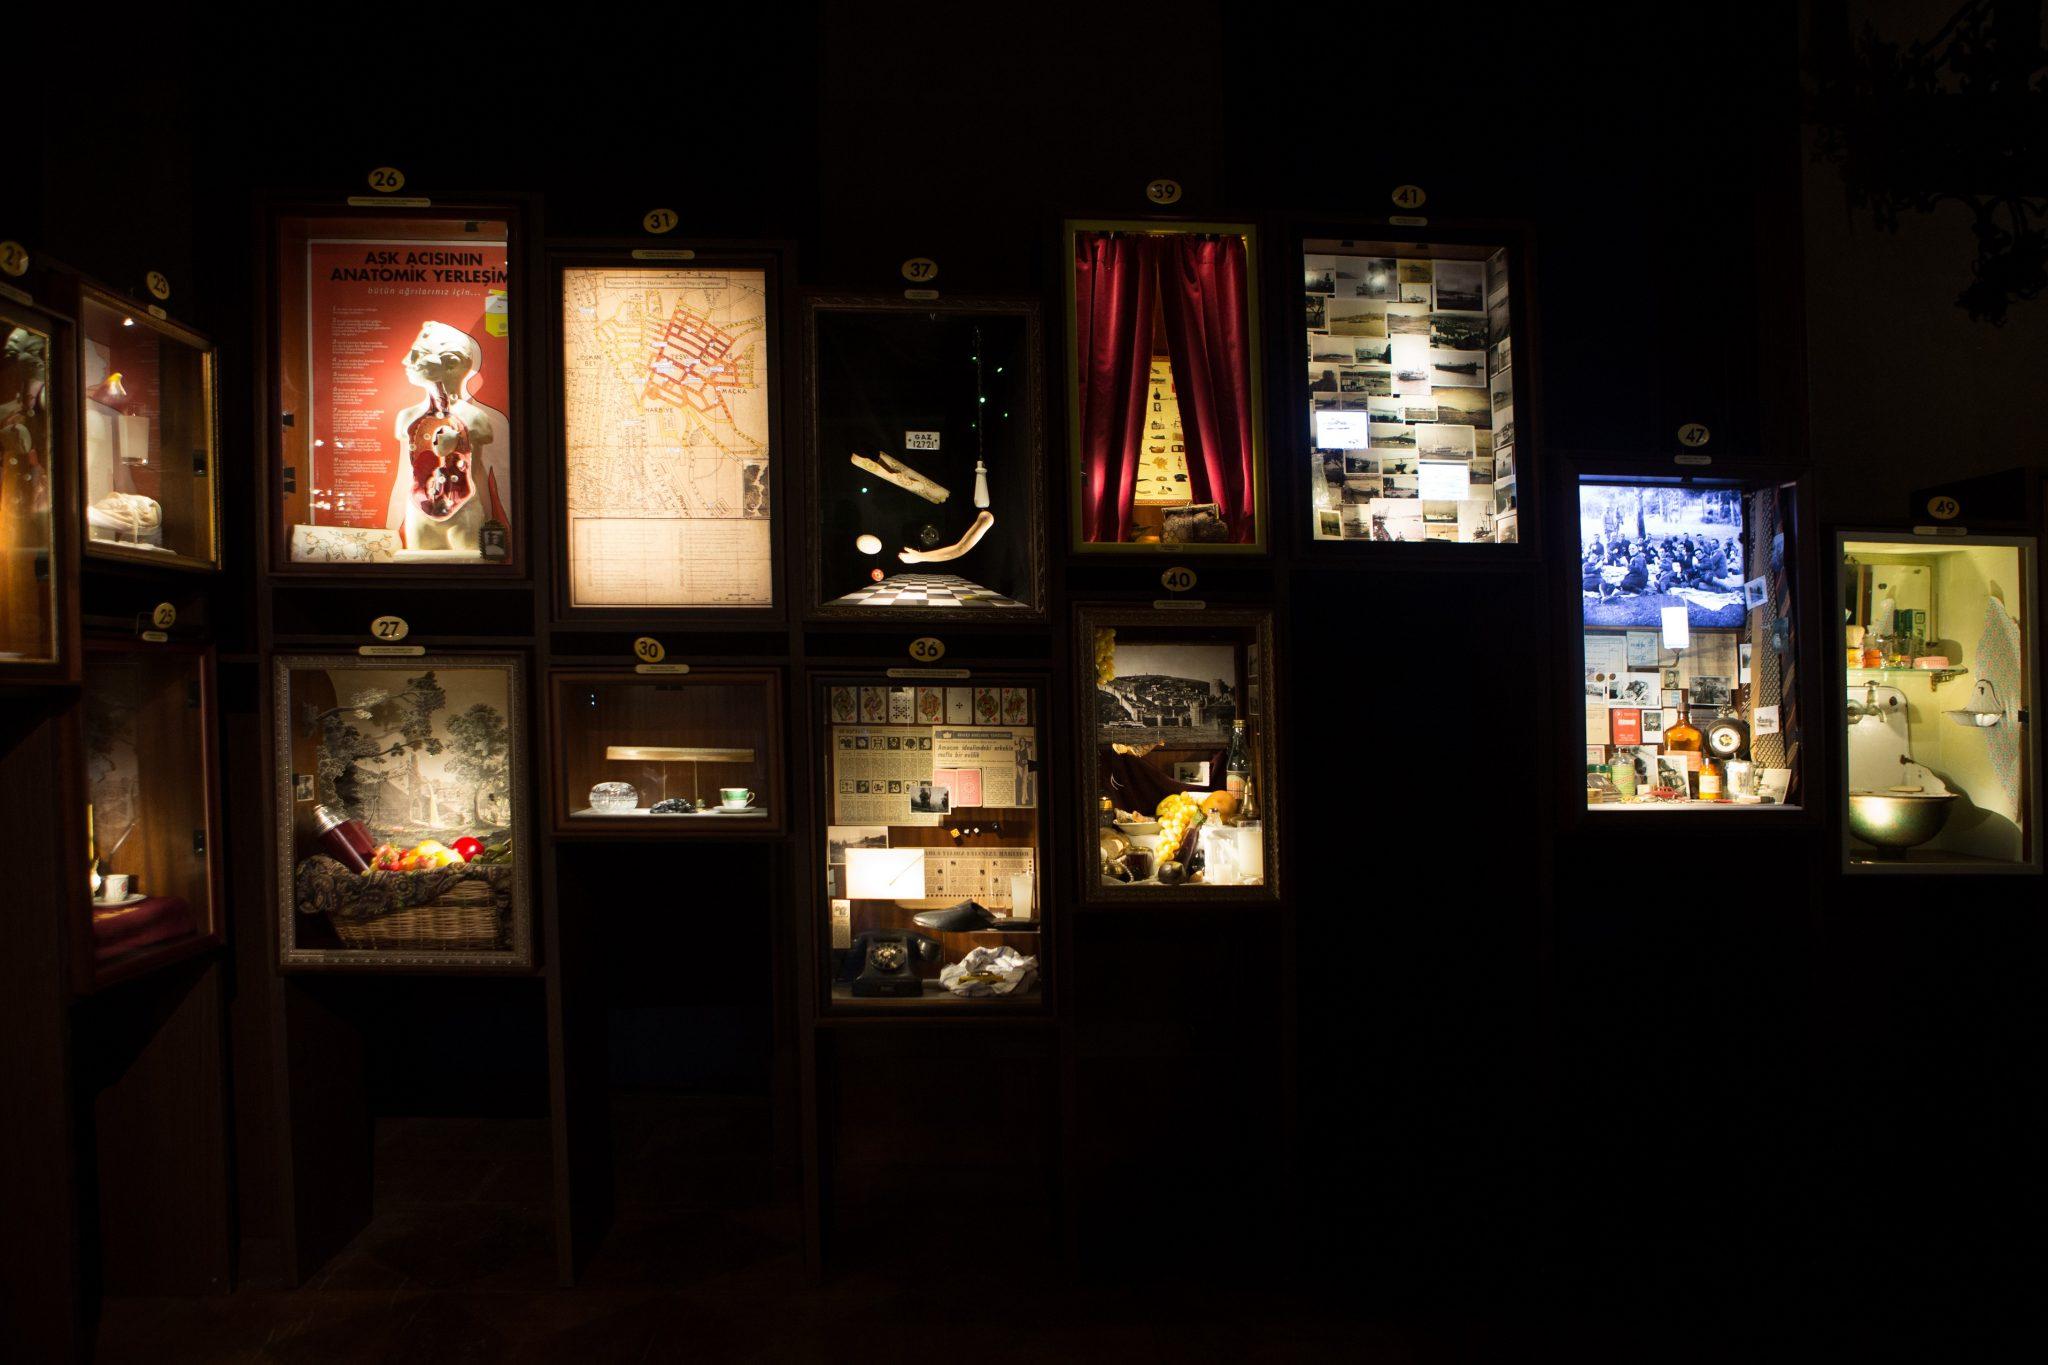 museo innocenza milano orhan pamuk